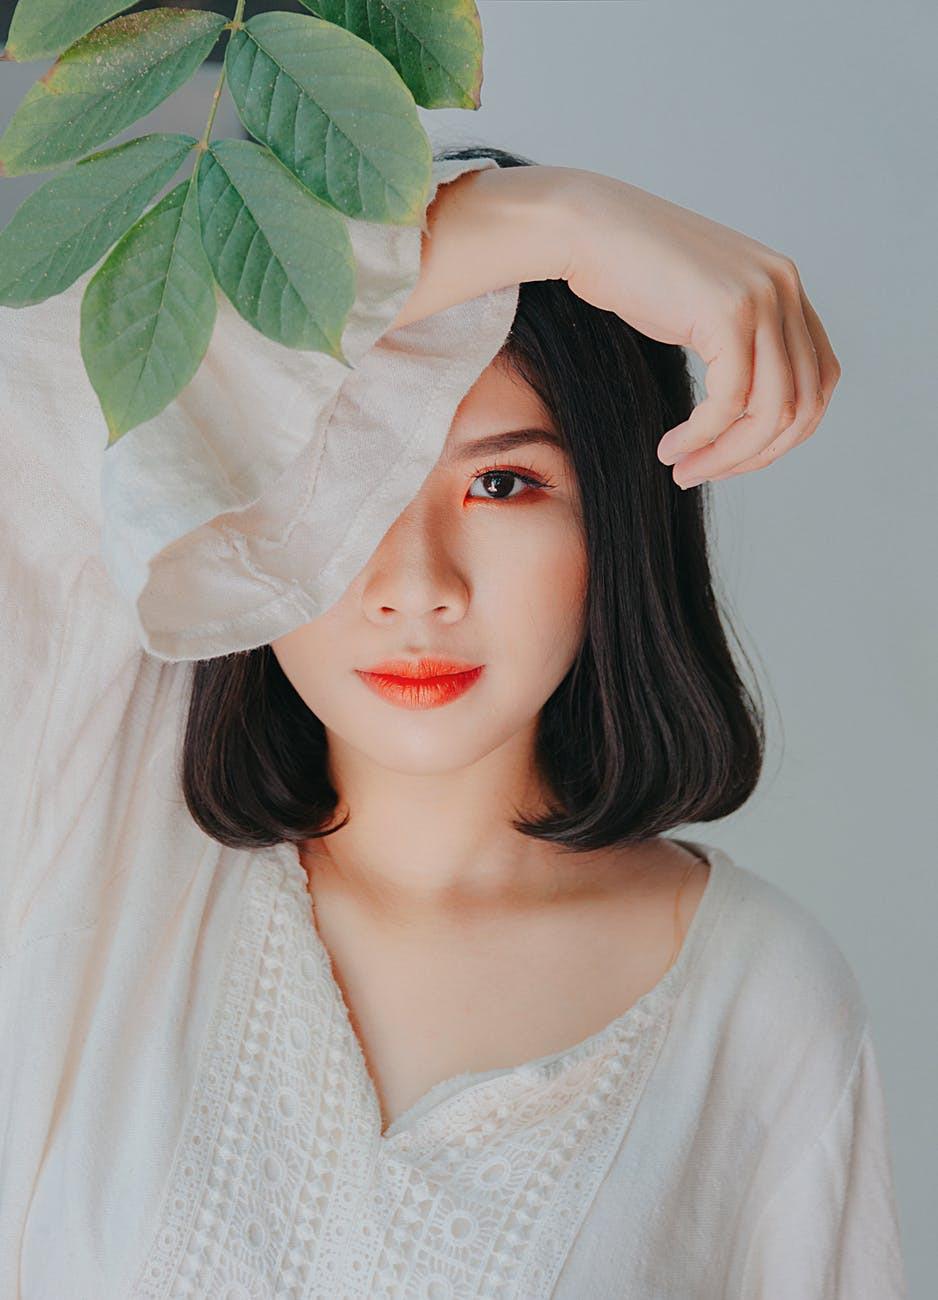 cuidado de la piel skin care rutina diaria daily rutine rostro face facial skin belleza beauty revista magazine moda panama mujeres 2019